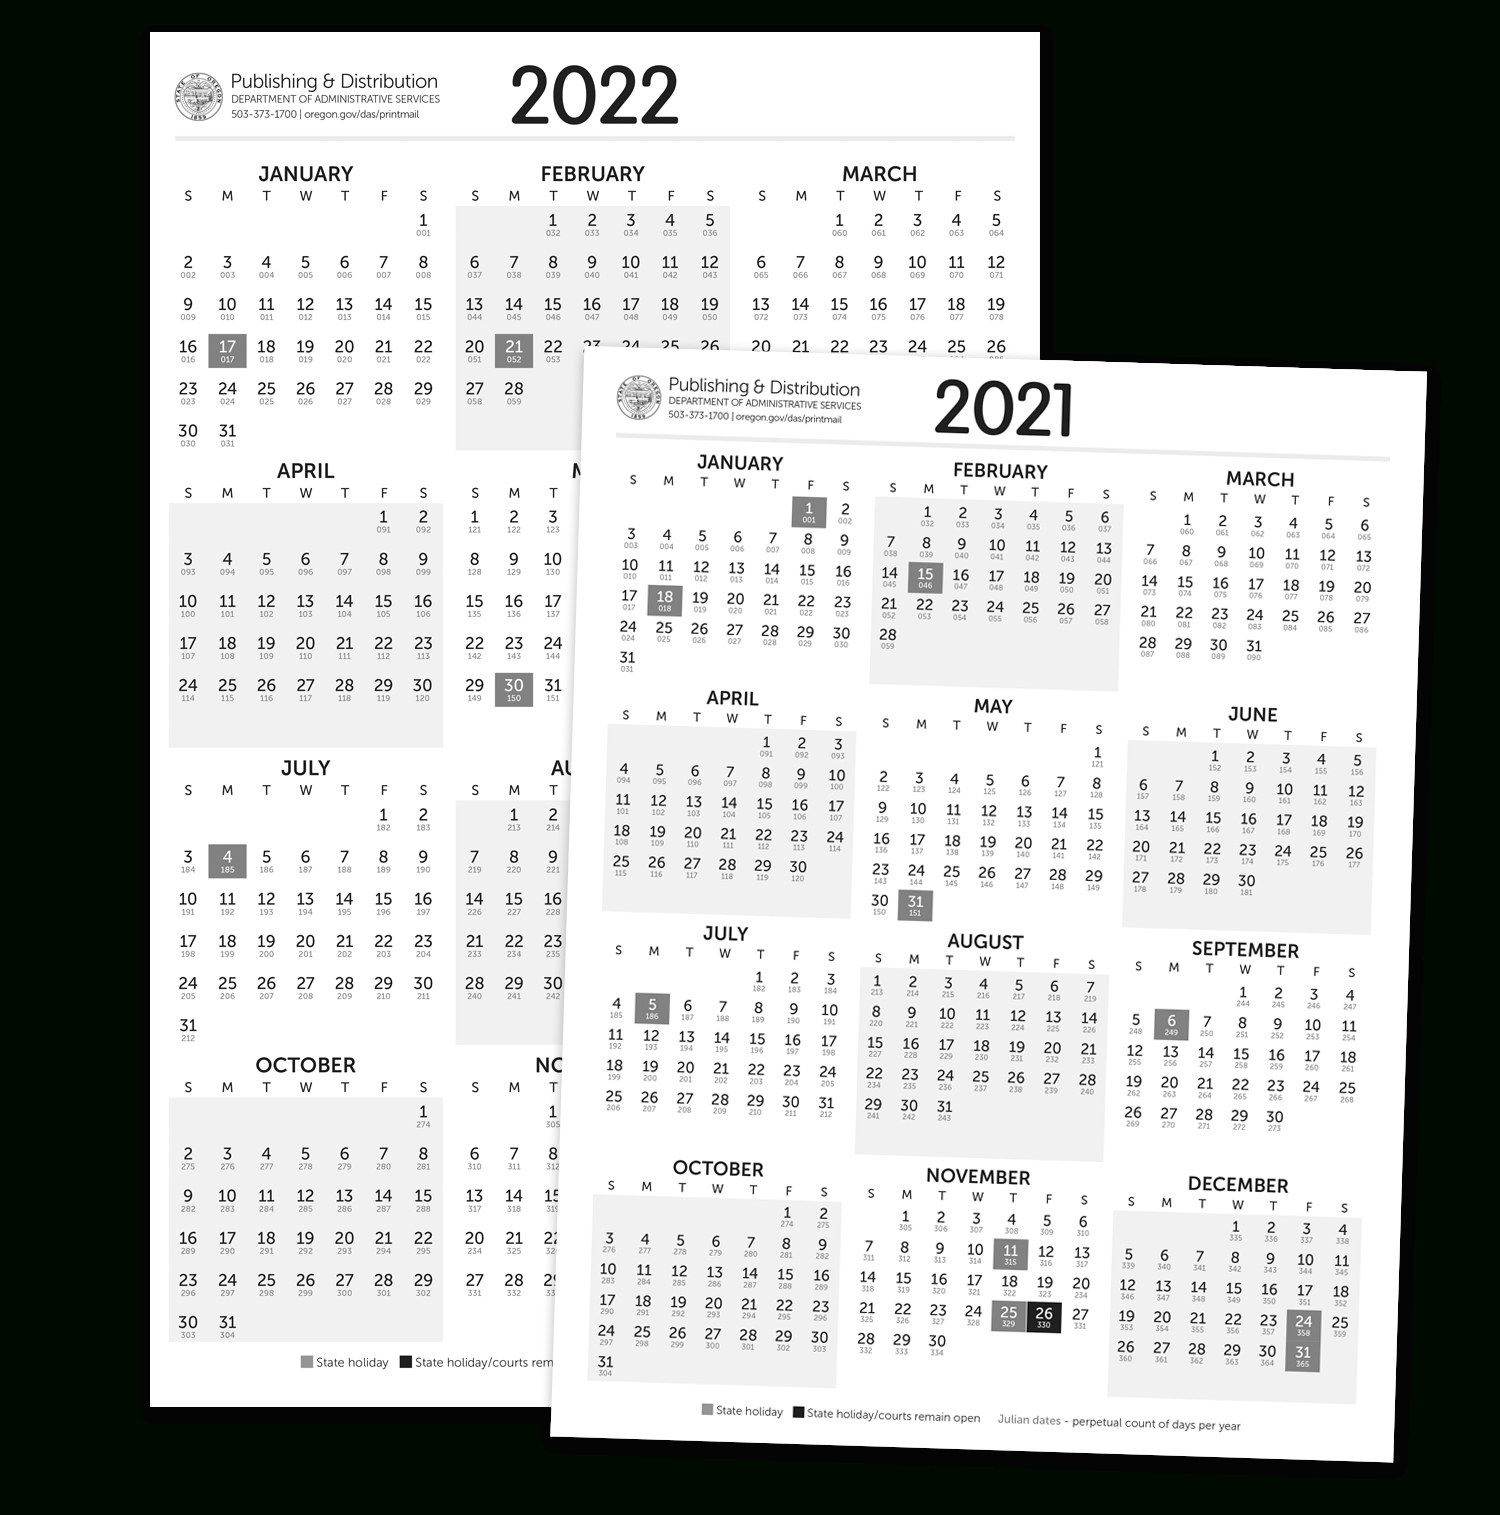 State Of Oregon: Printing, Mailing And Distribution with Julian Calendar 2022 Printable